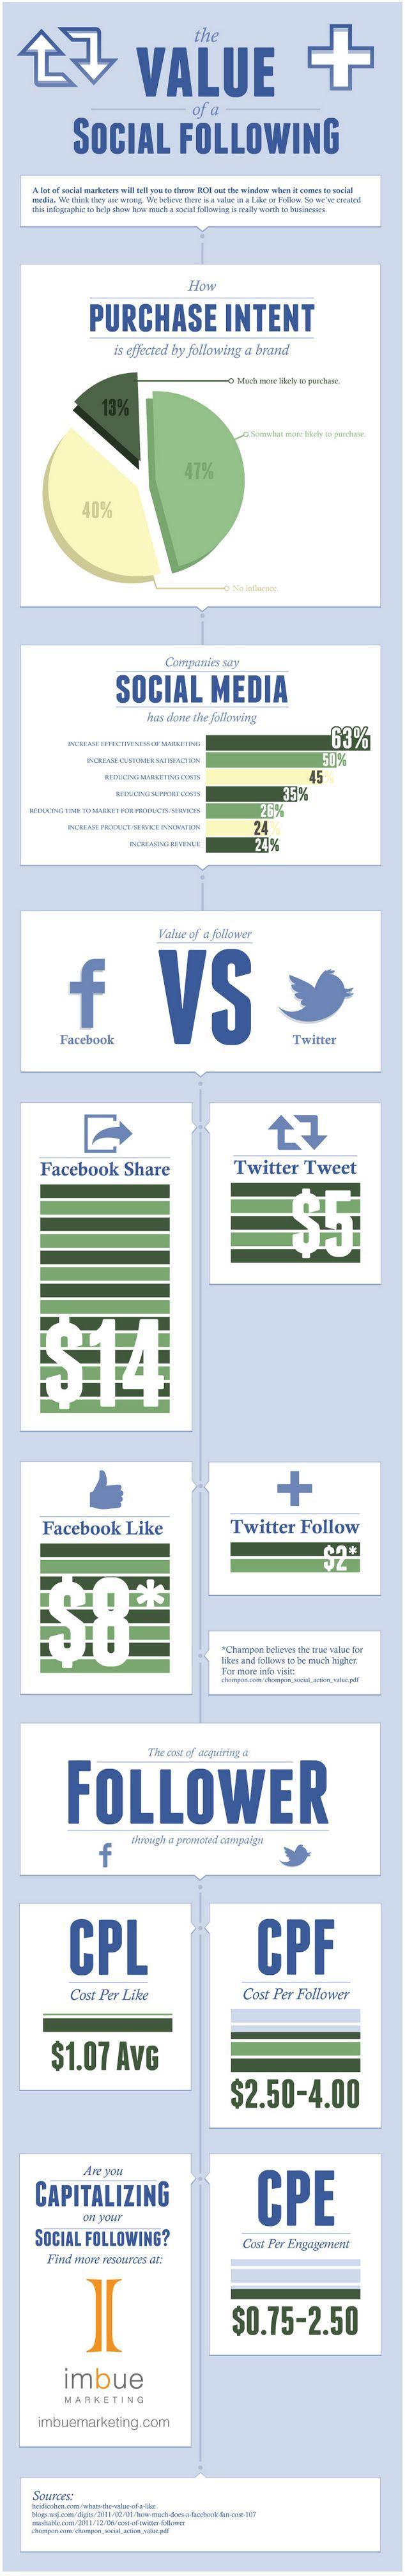 value-of-social-following